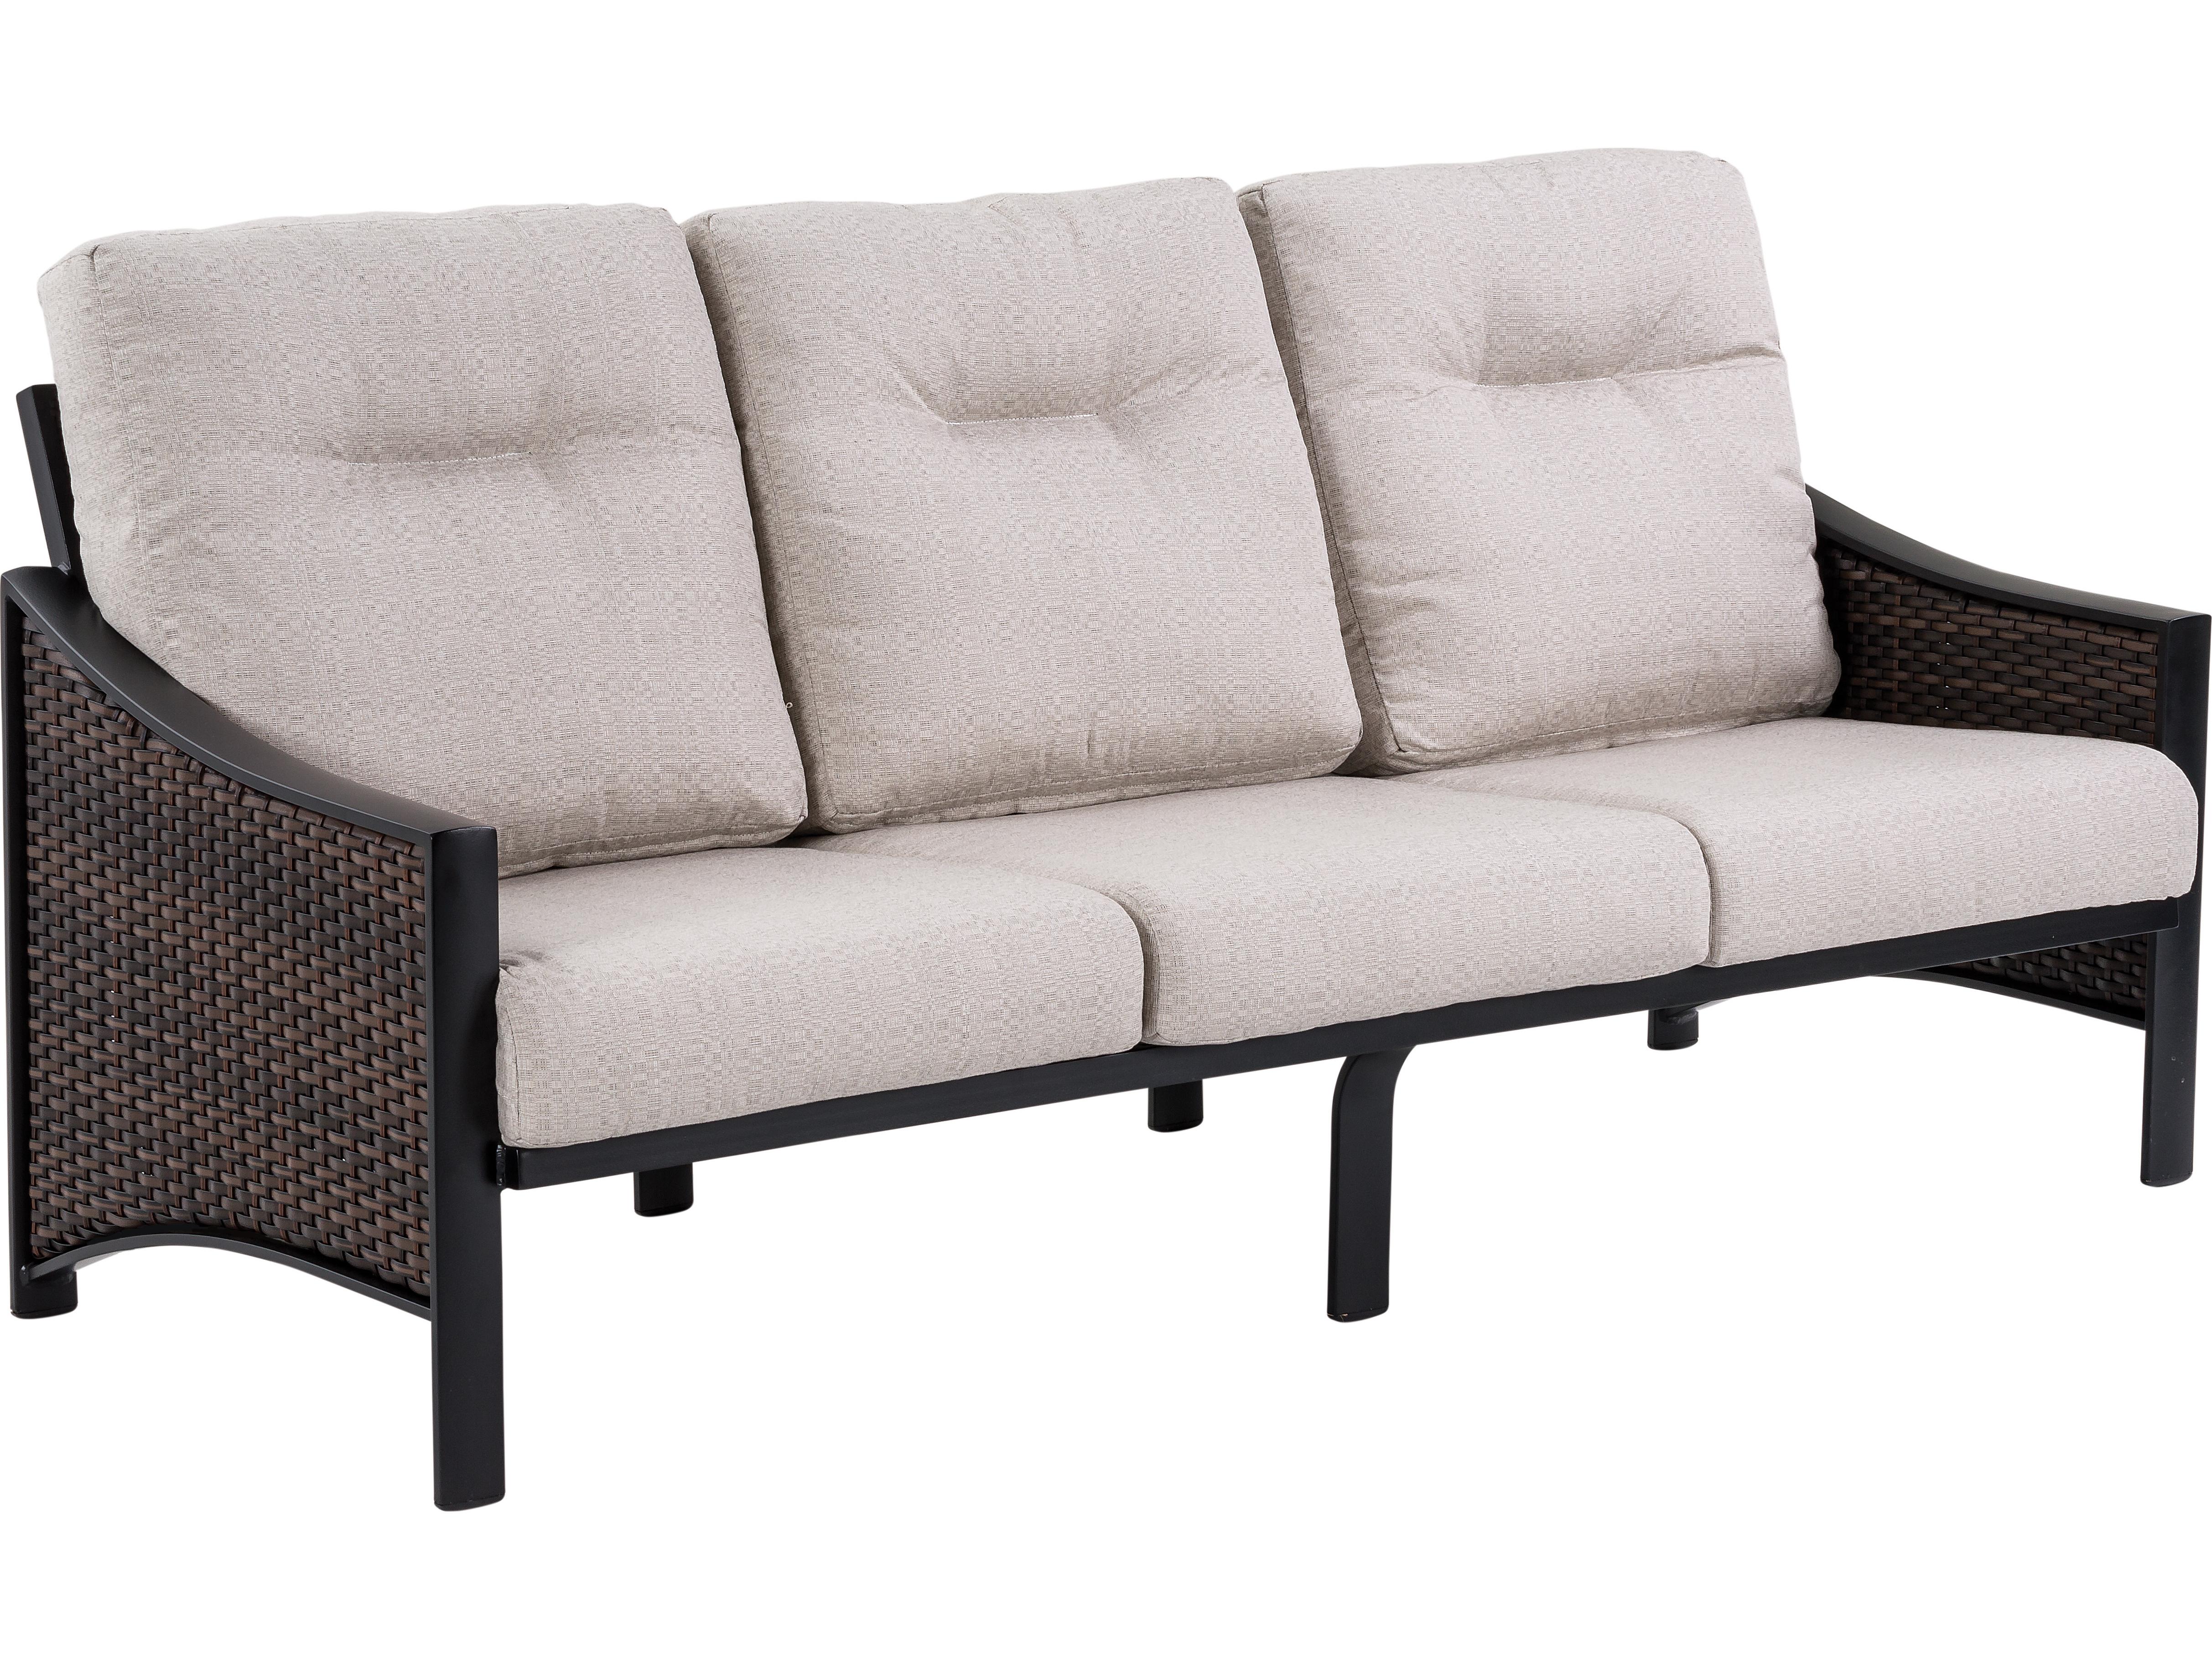 9f18c7058de Tropitone Kenzo Woven Cushion Sofa. Hover to zoom